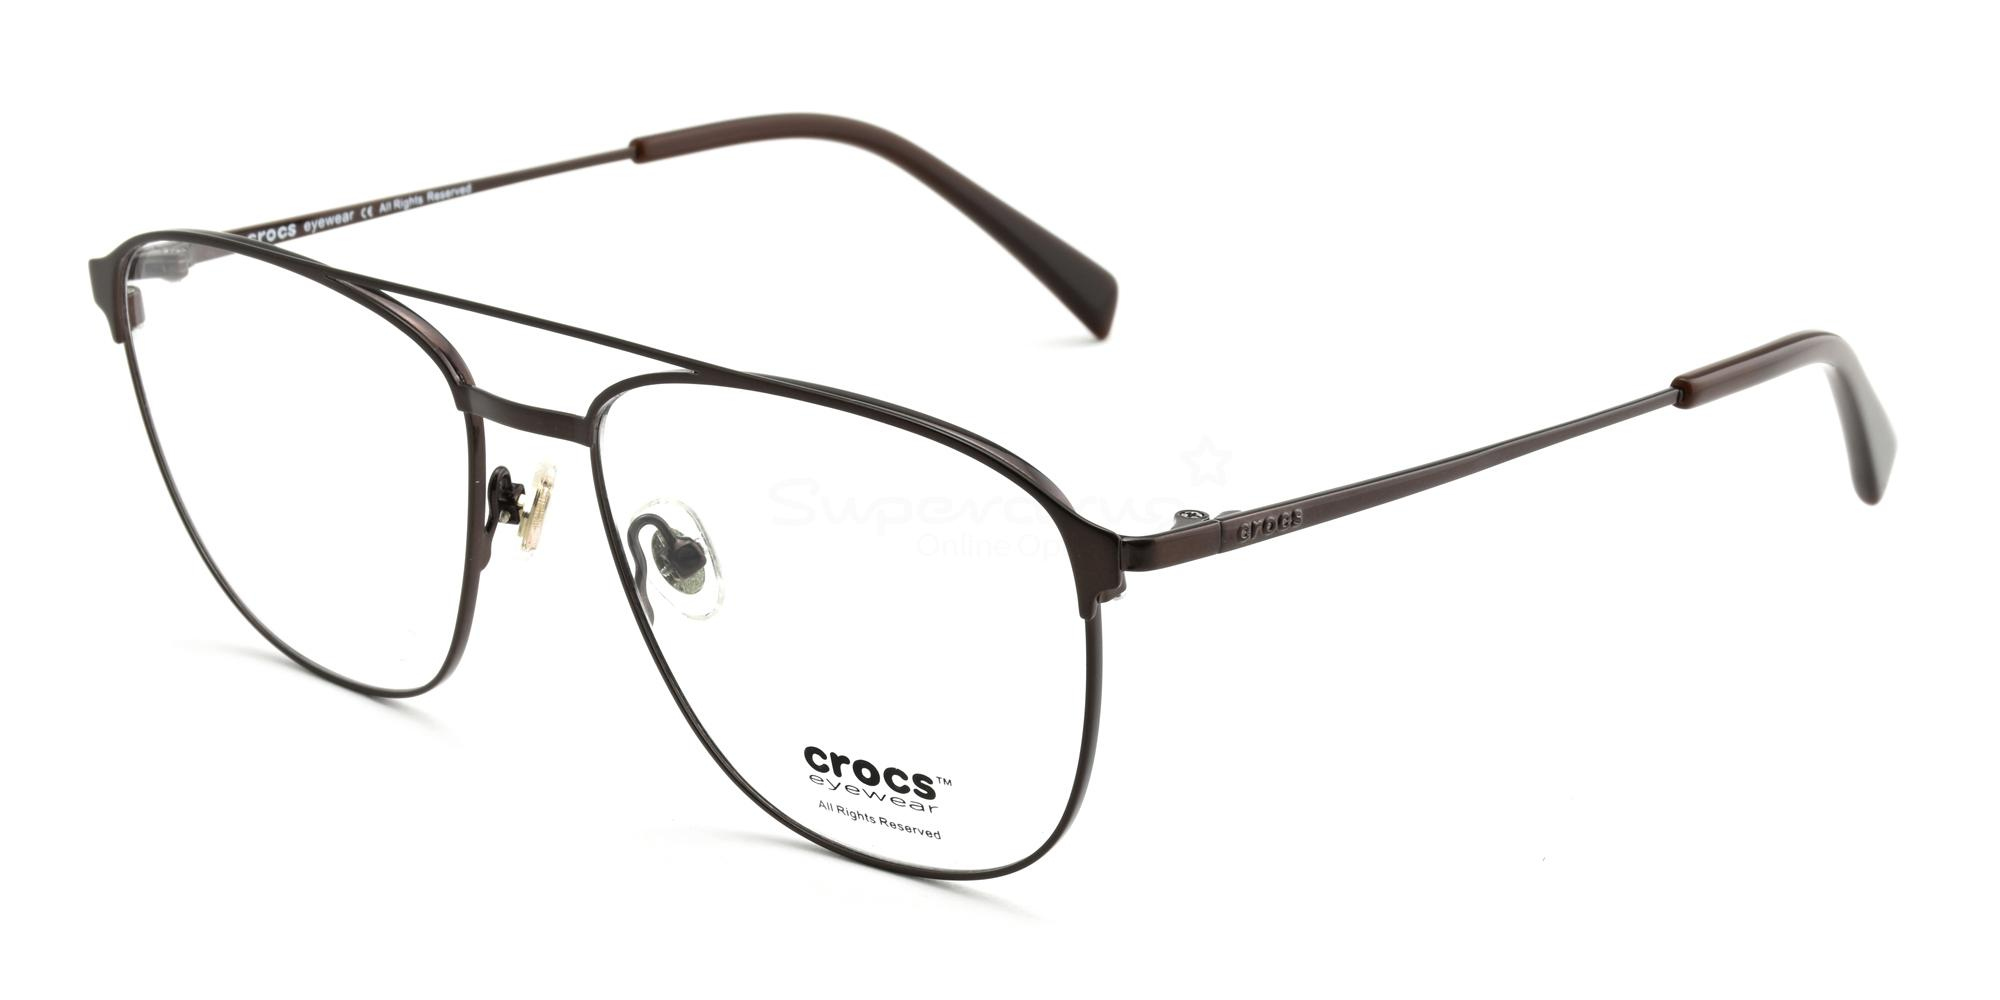 40BN CF4370 Glasses, Crocs Eyewear